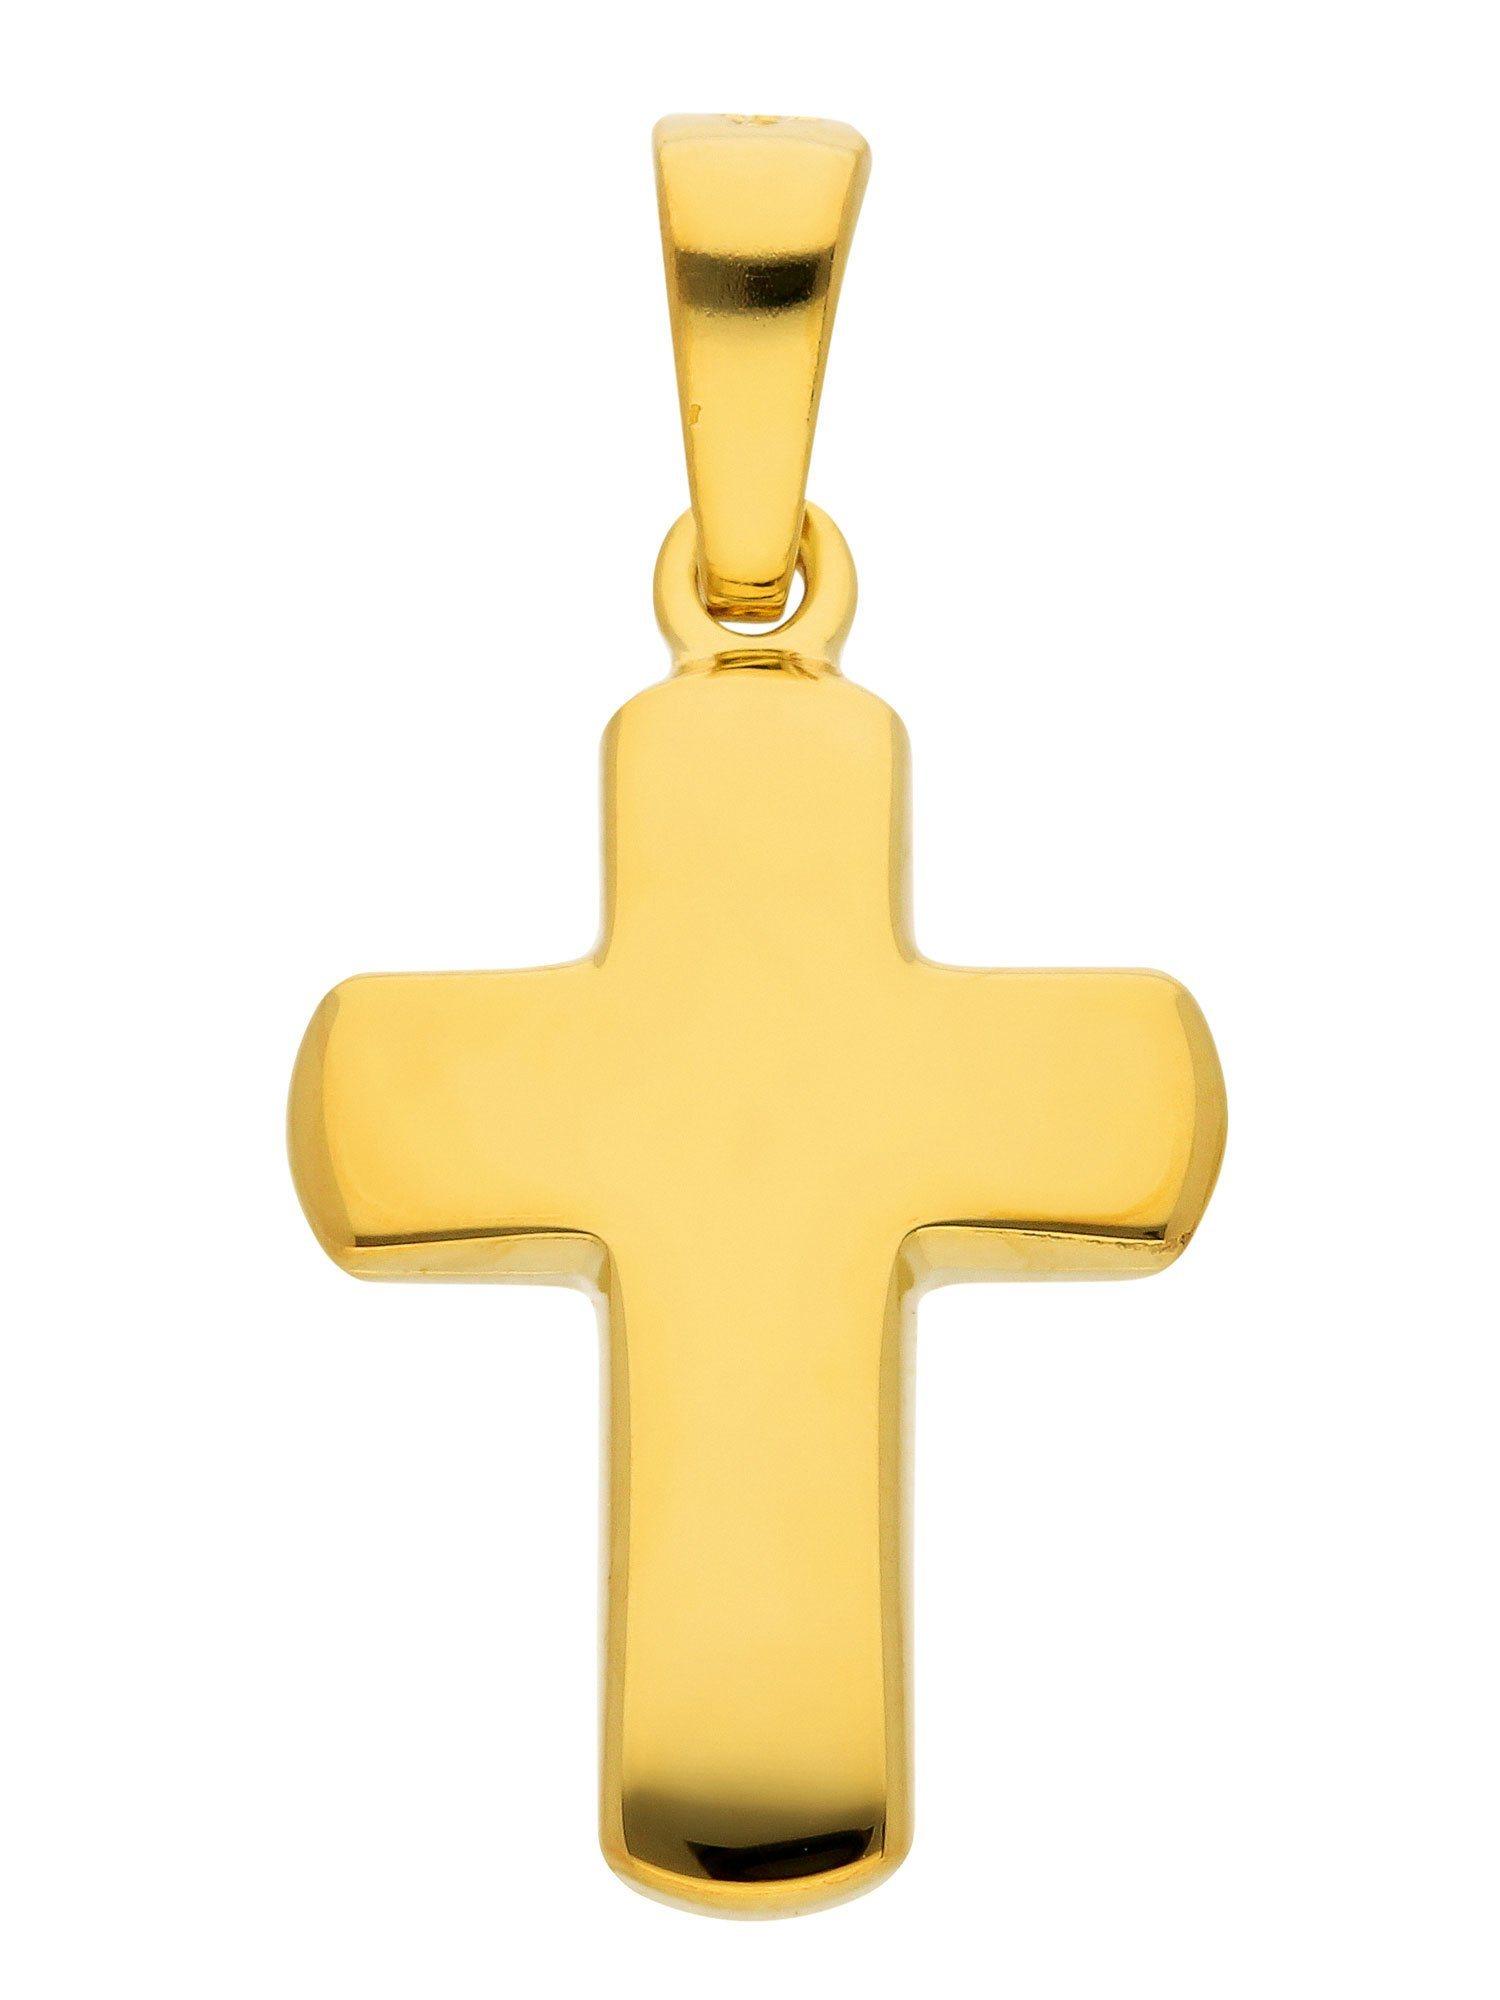 Adelia´s Kettenanhänger »Silber Anhänger« 925 Sterling Silber vergoldet   Schmuck > Halsketten > Ketten ohne Anhänger   Goldfarben   Adelia´s